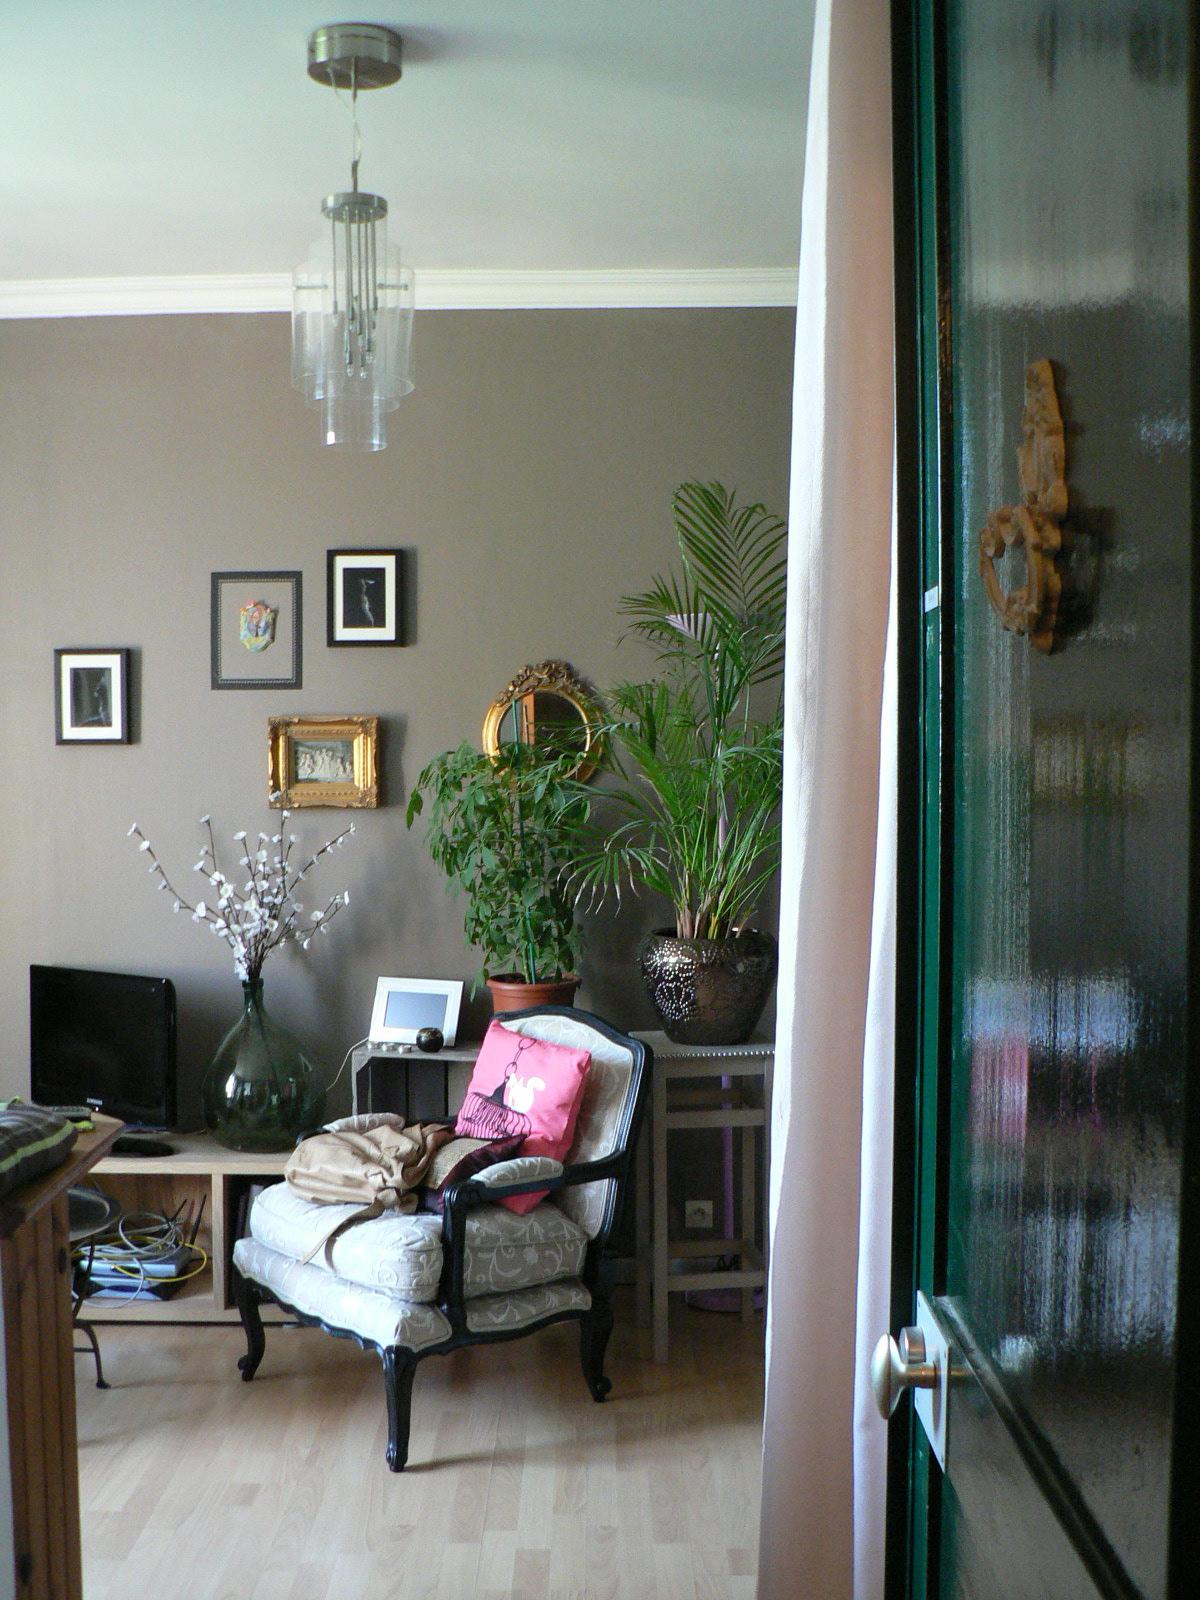 vivre dans la vall e de l 39 yerres l 39 entr e. Black Bedroom Furniture Sets. Home Design Ideas